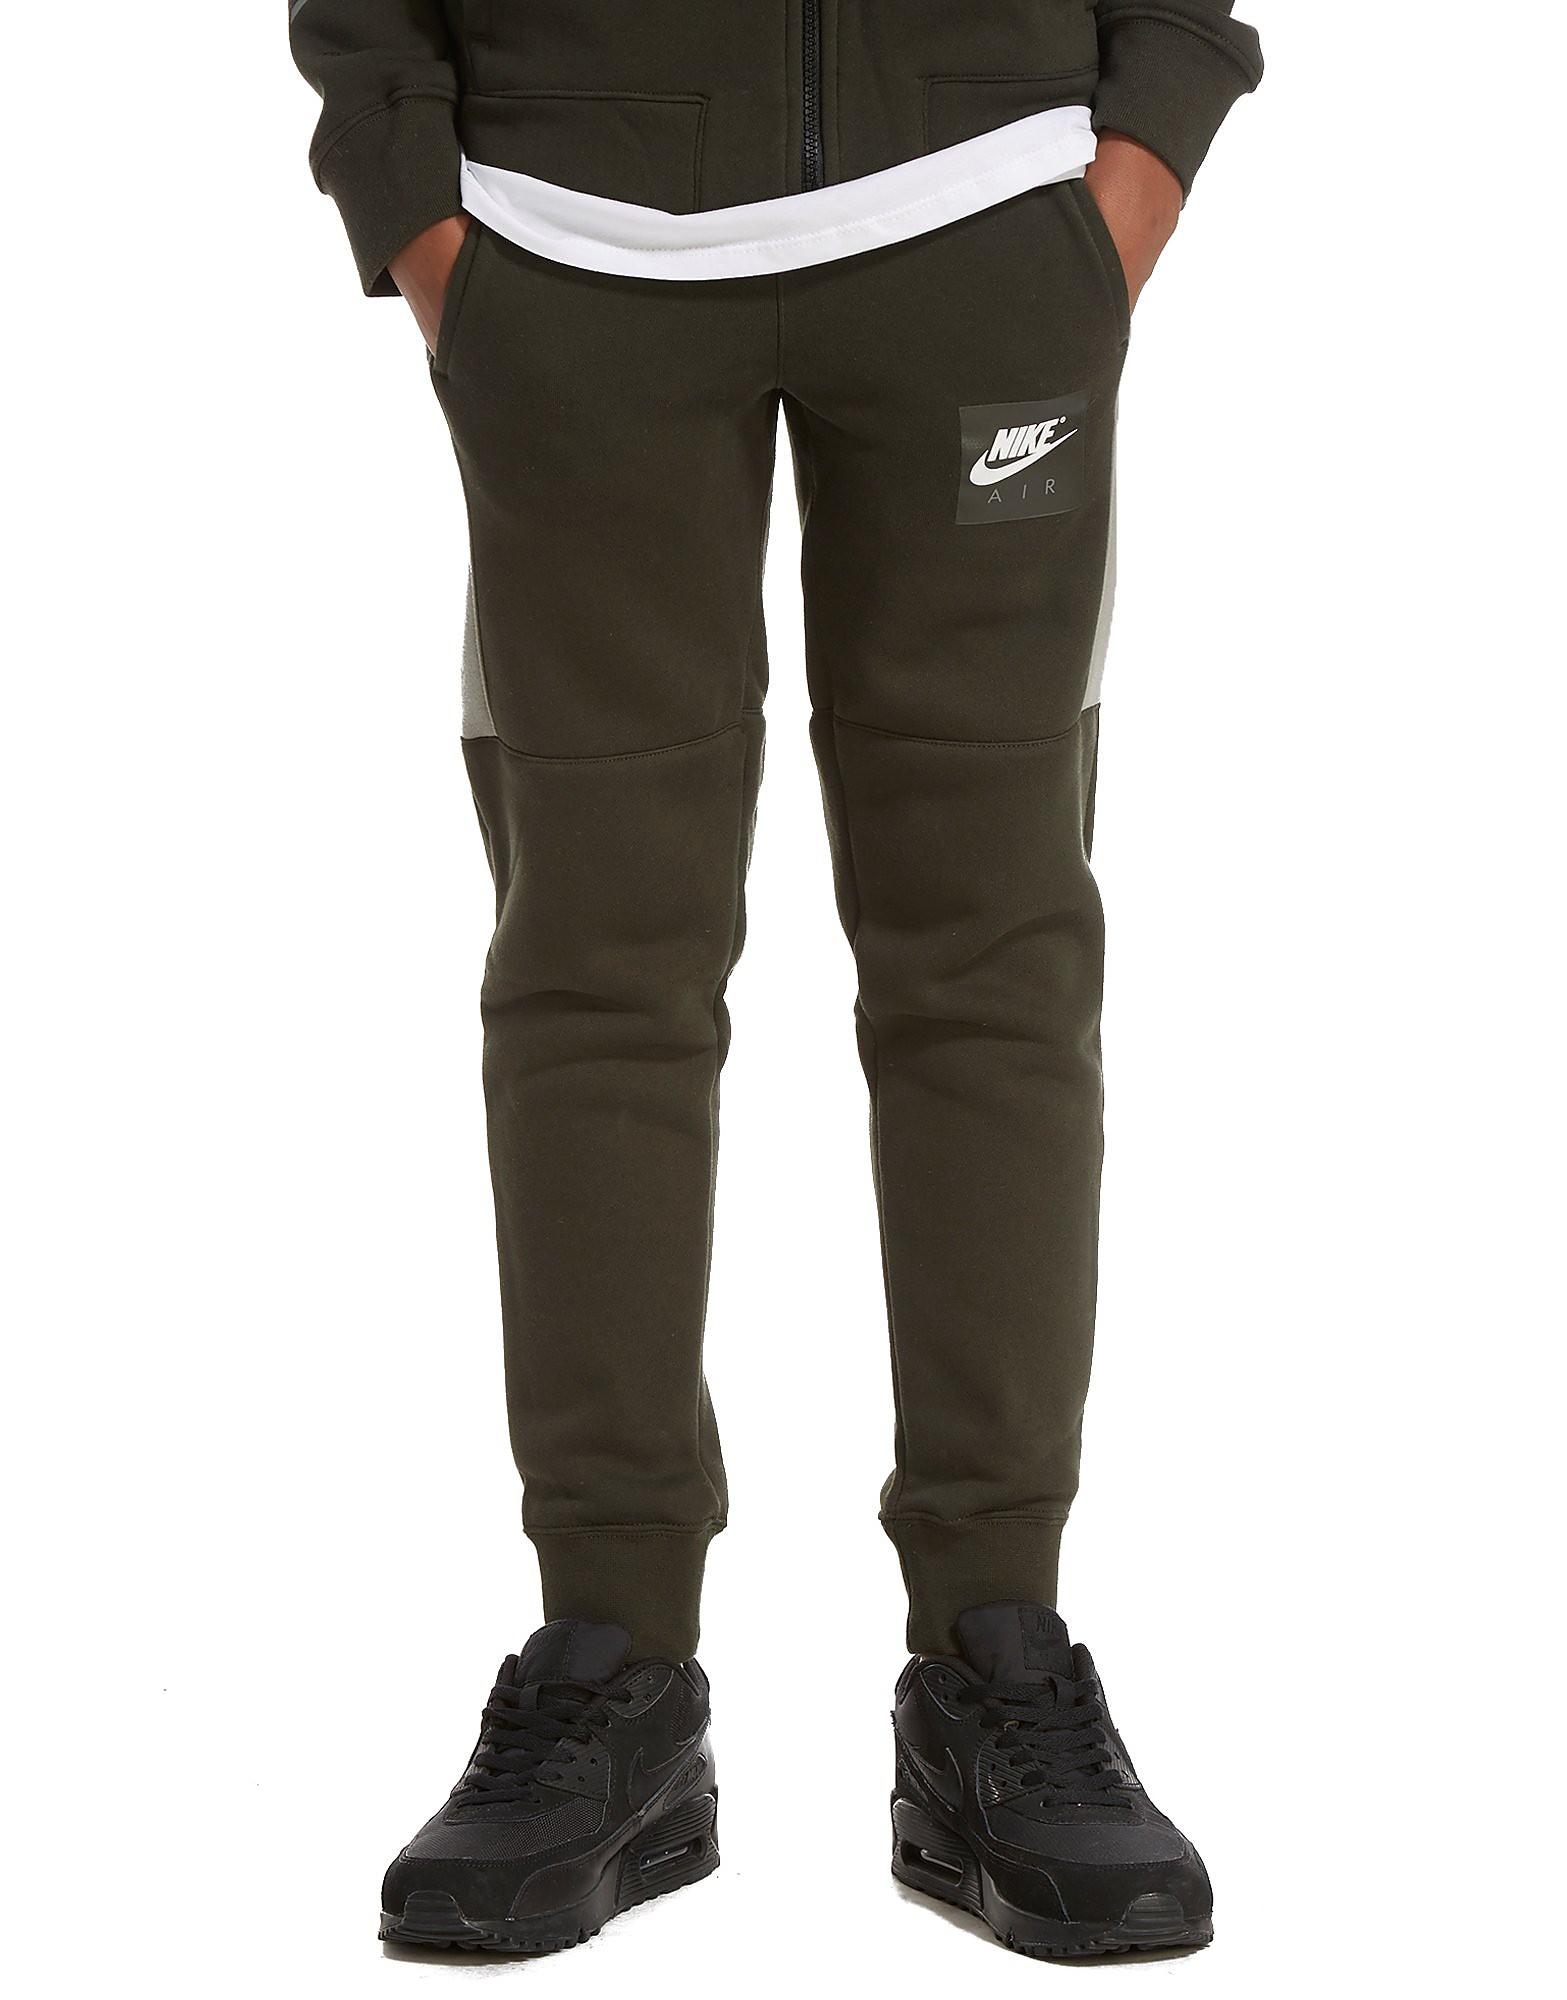 Nike pantalón Air júnior